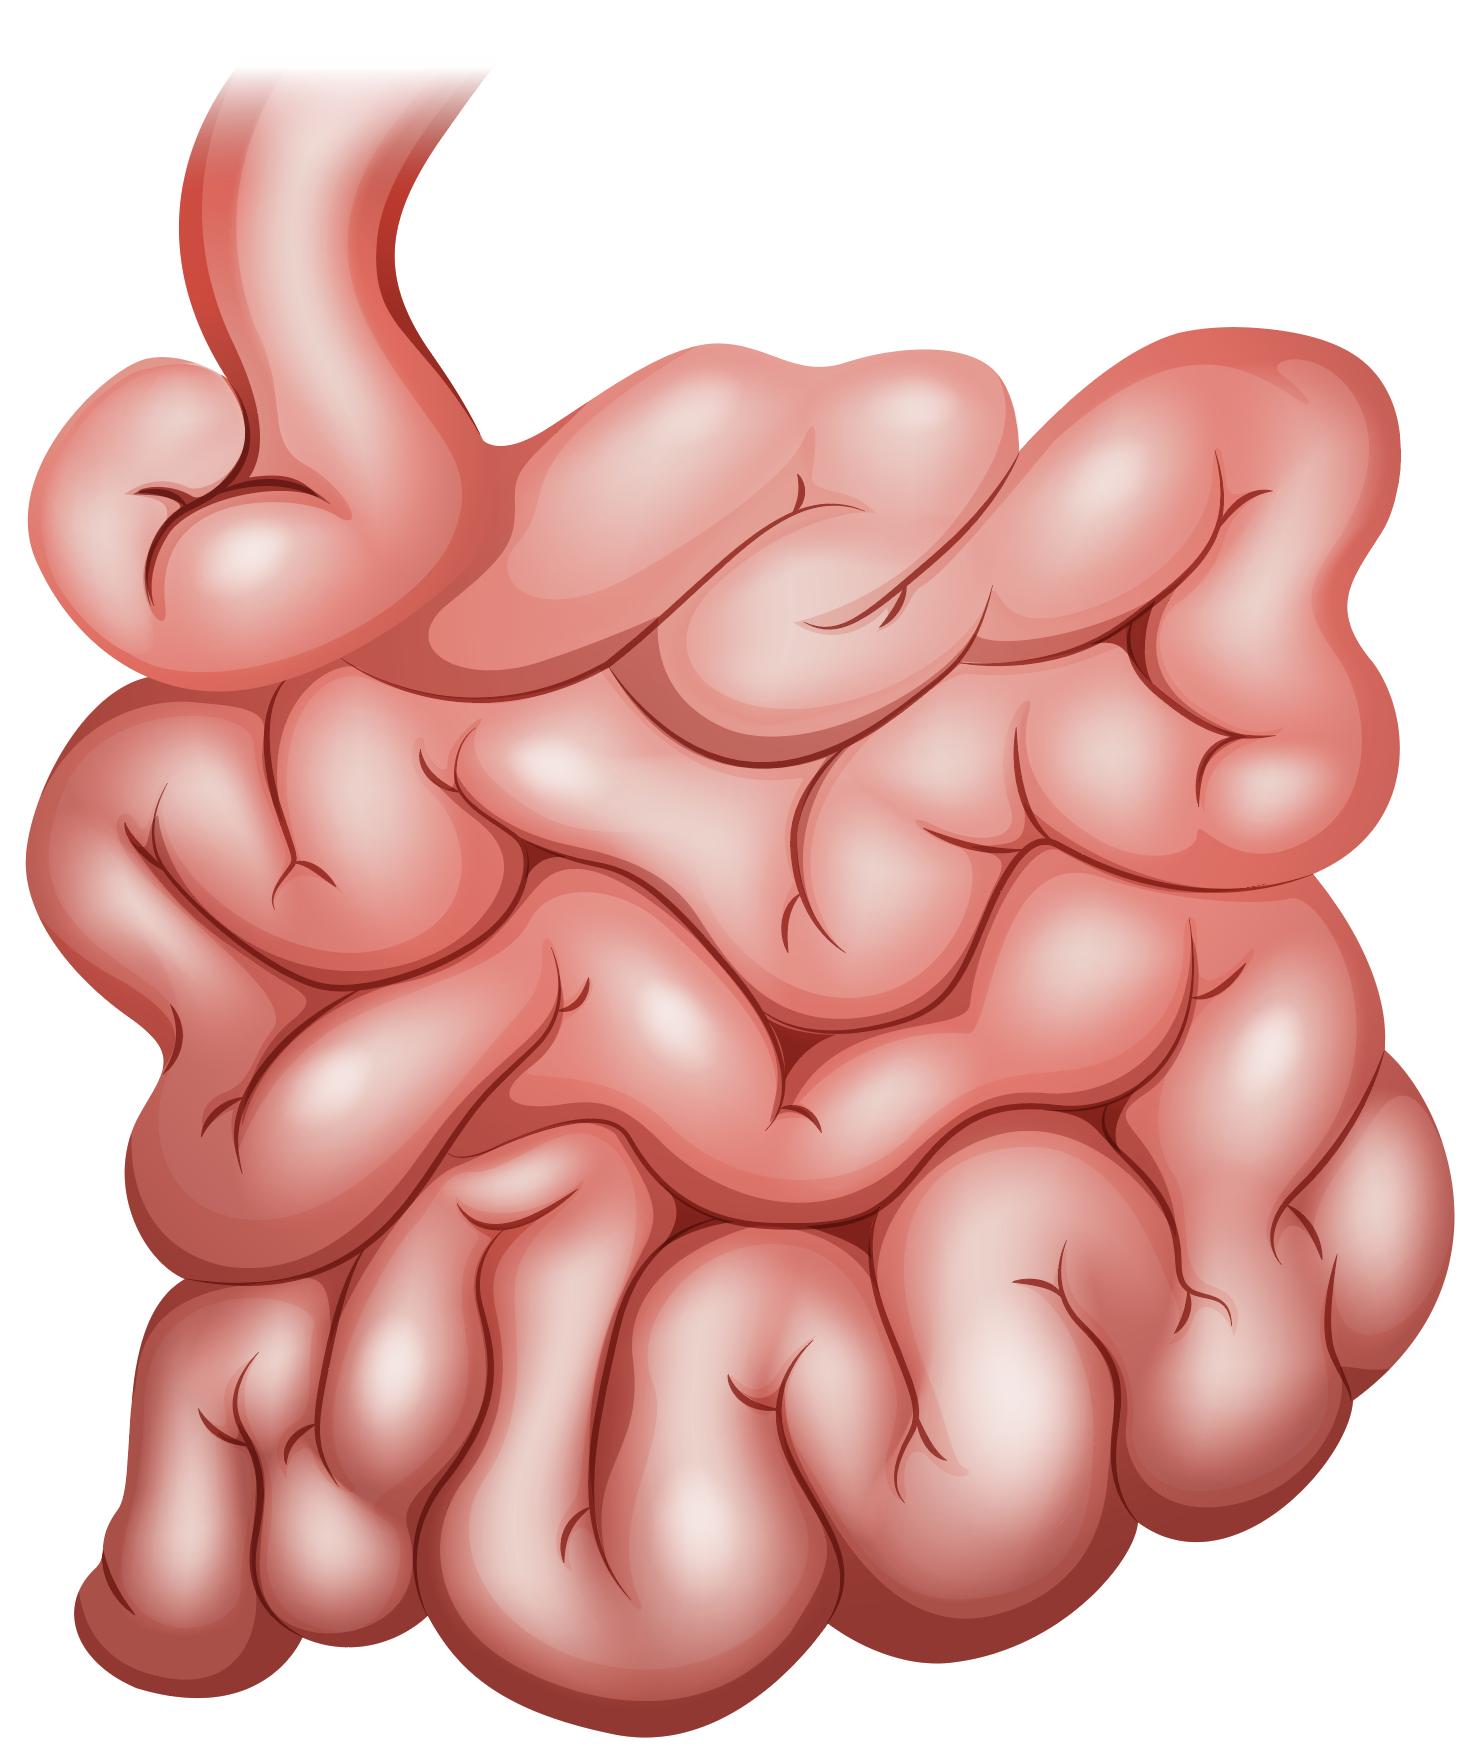 small bowel - Click Here